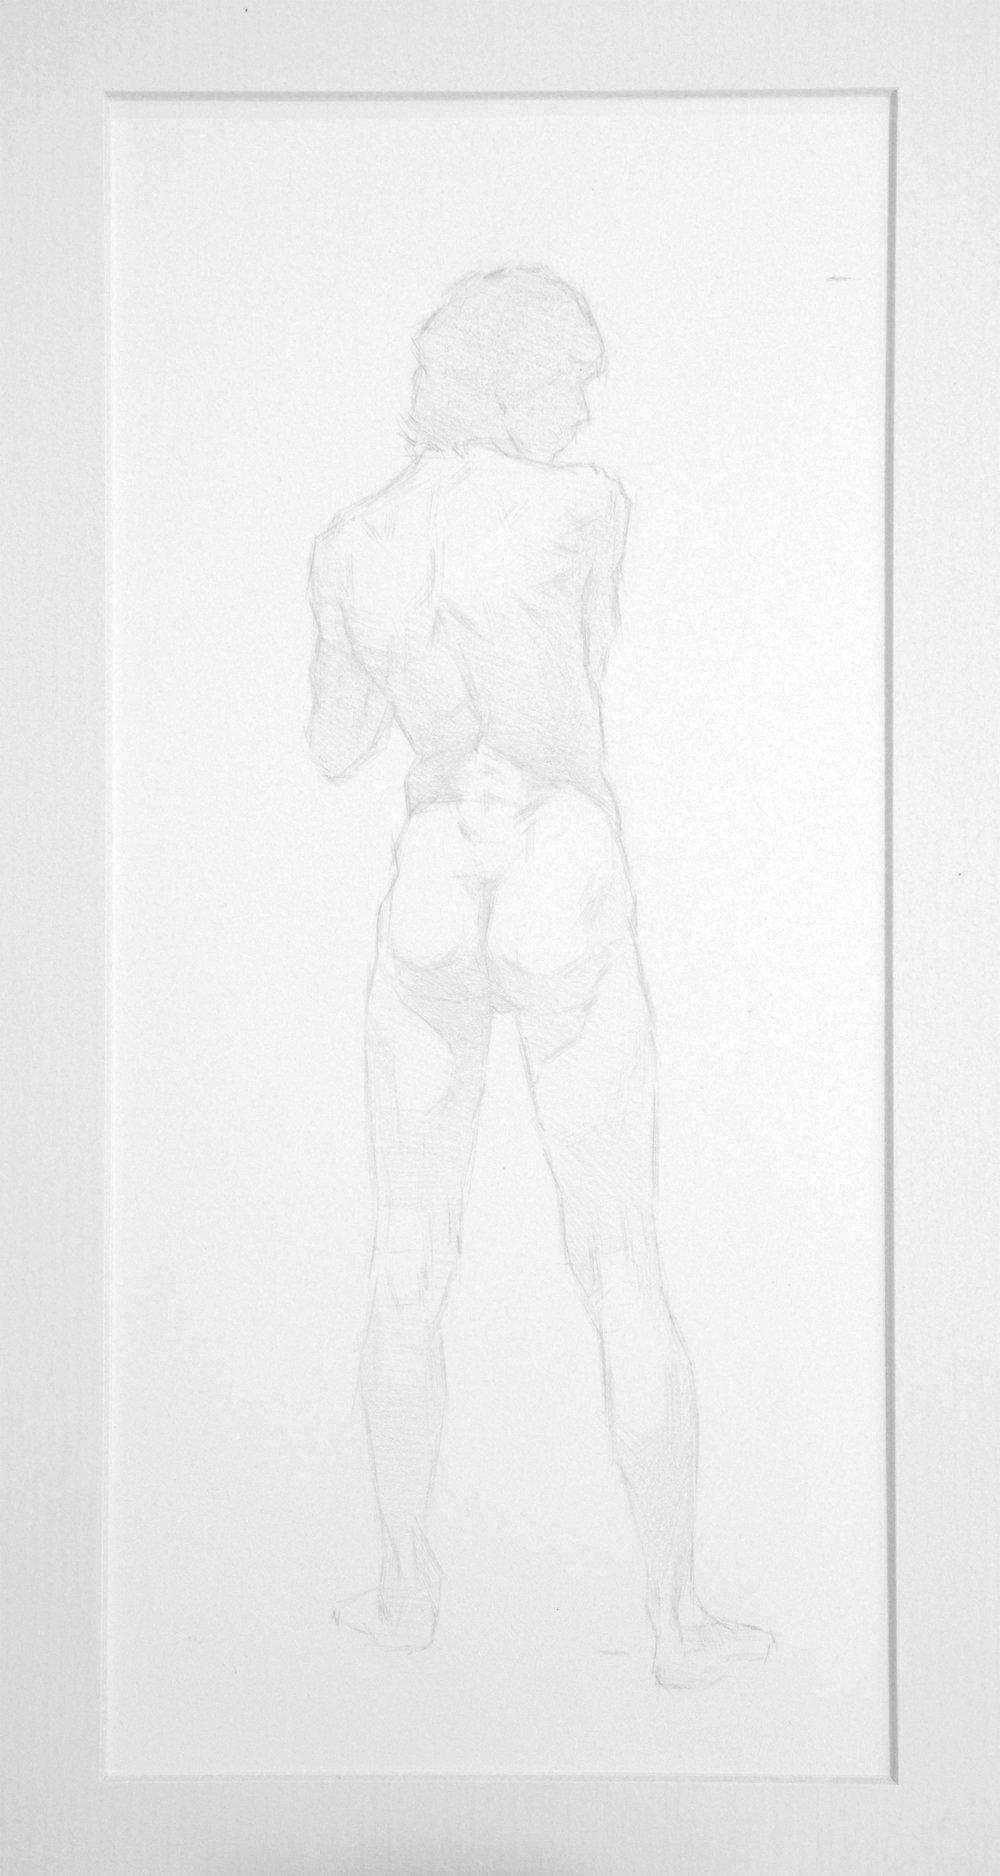 Inigo_Figure_5.jpg